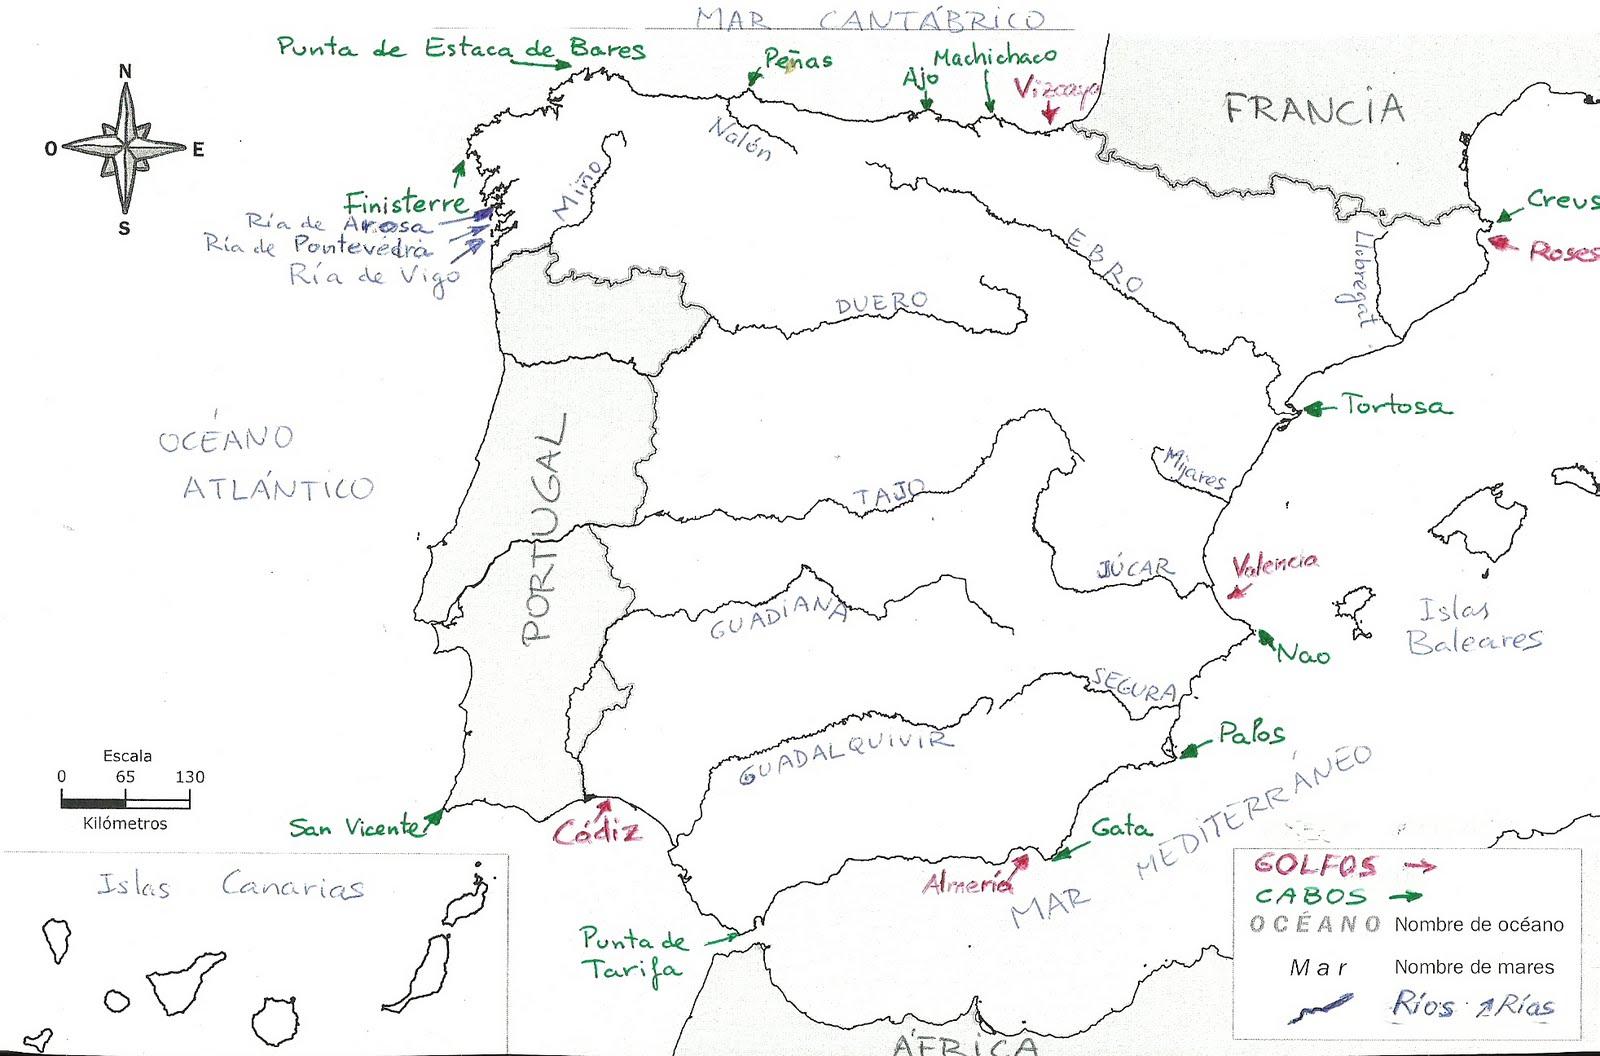 PZ C mapa espaa politico